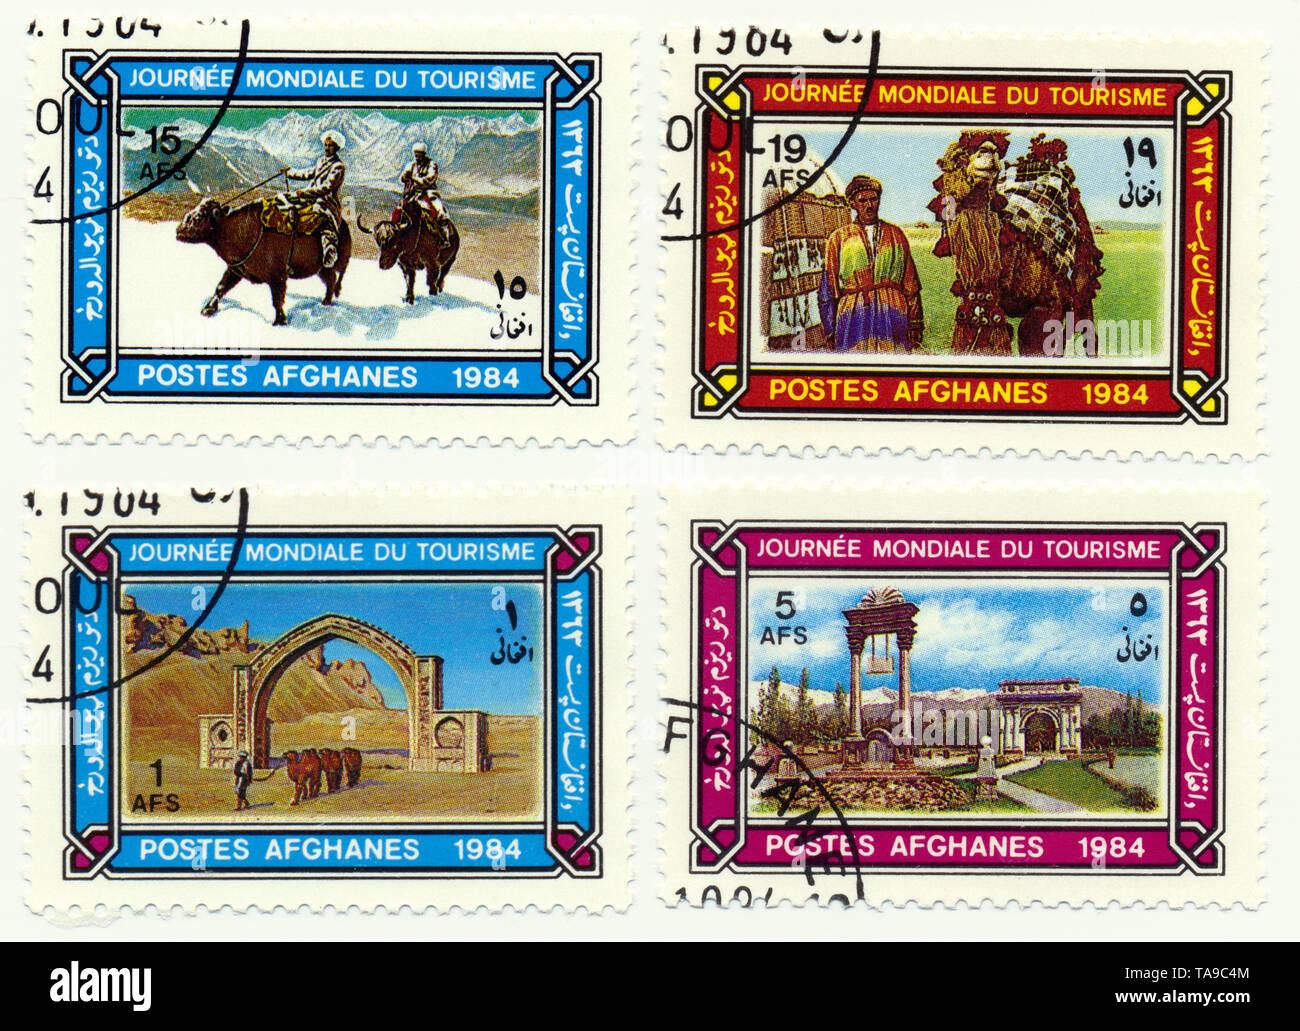 Historic postage stamps from Afghanistan, celebration of the World Tourism Day, Historische Briefmarken aus Afghanistan zum Welttourismustag, 1984 - Stock Image